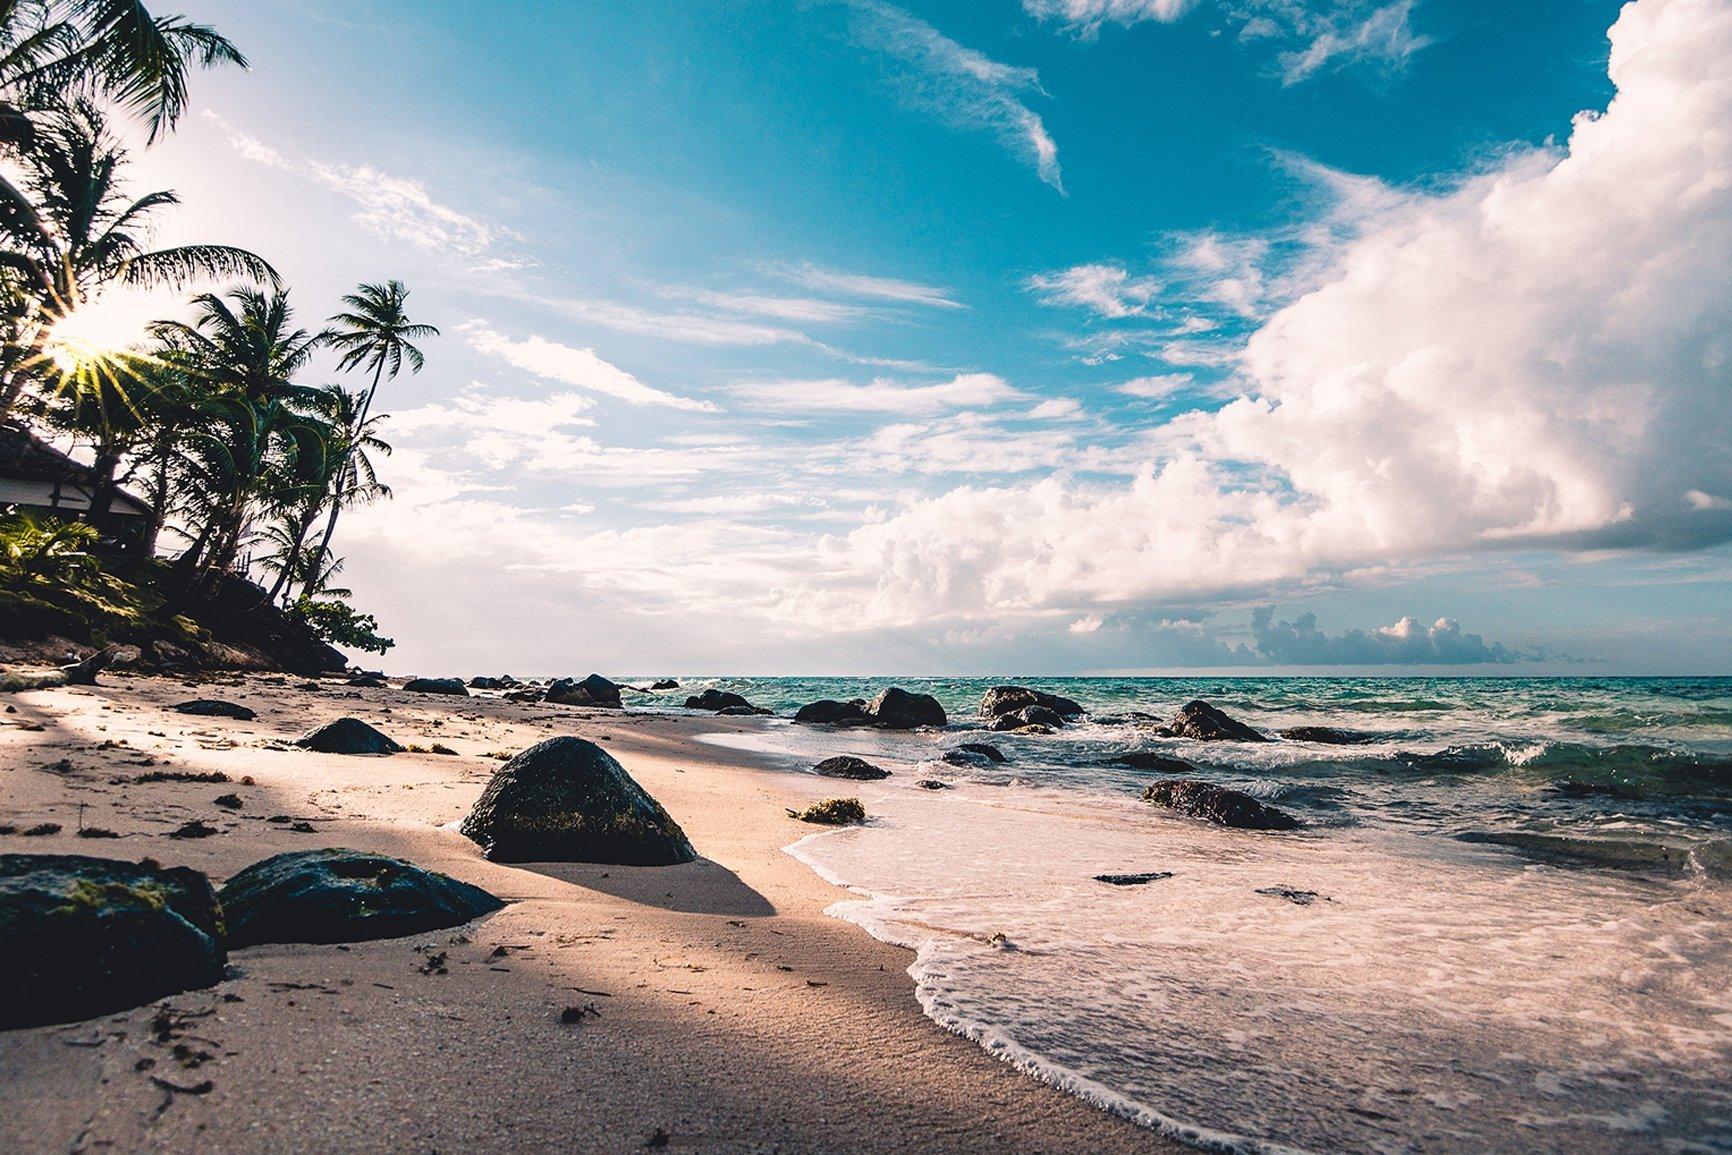 profumi naturali fragranze marine